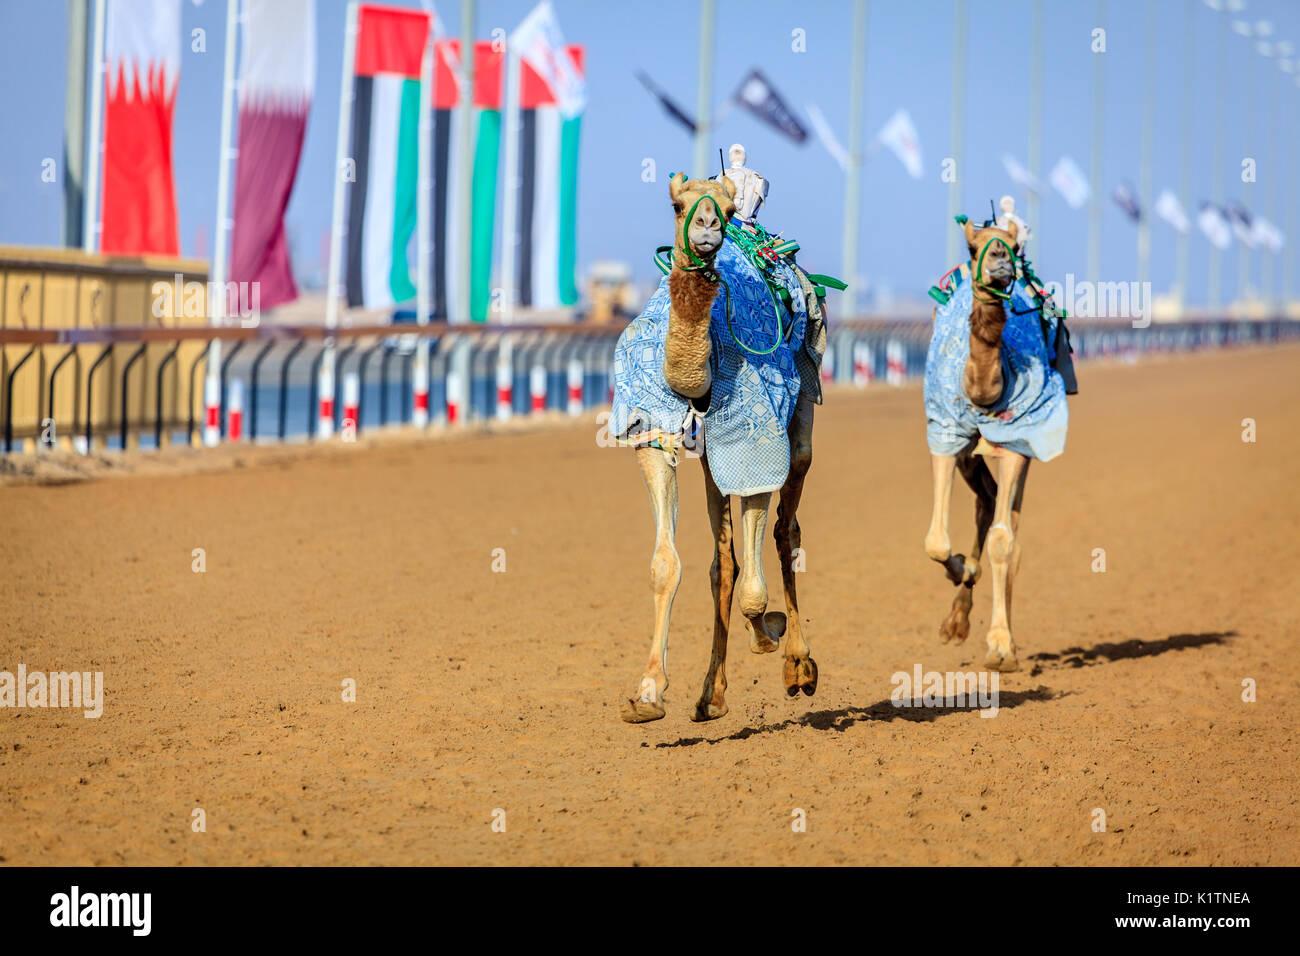 I cammelli con robot jokeys at racing pratica vicino a Dubai, Emirati arabi uniti Immagini Stock